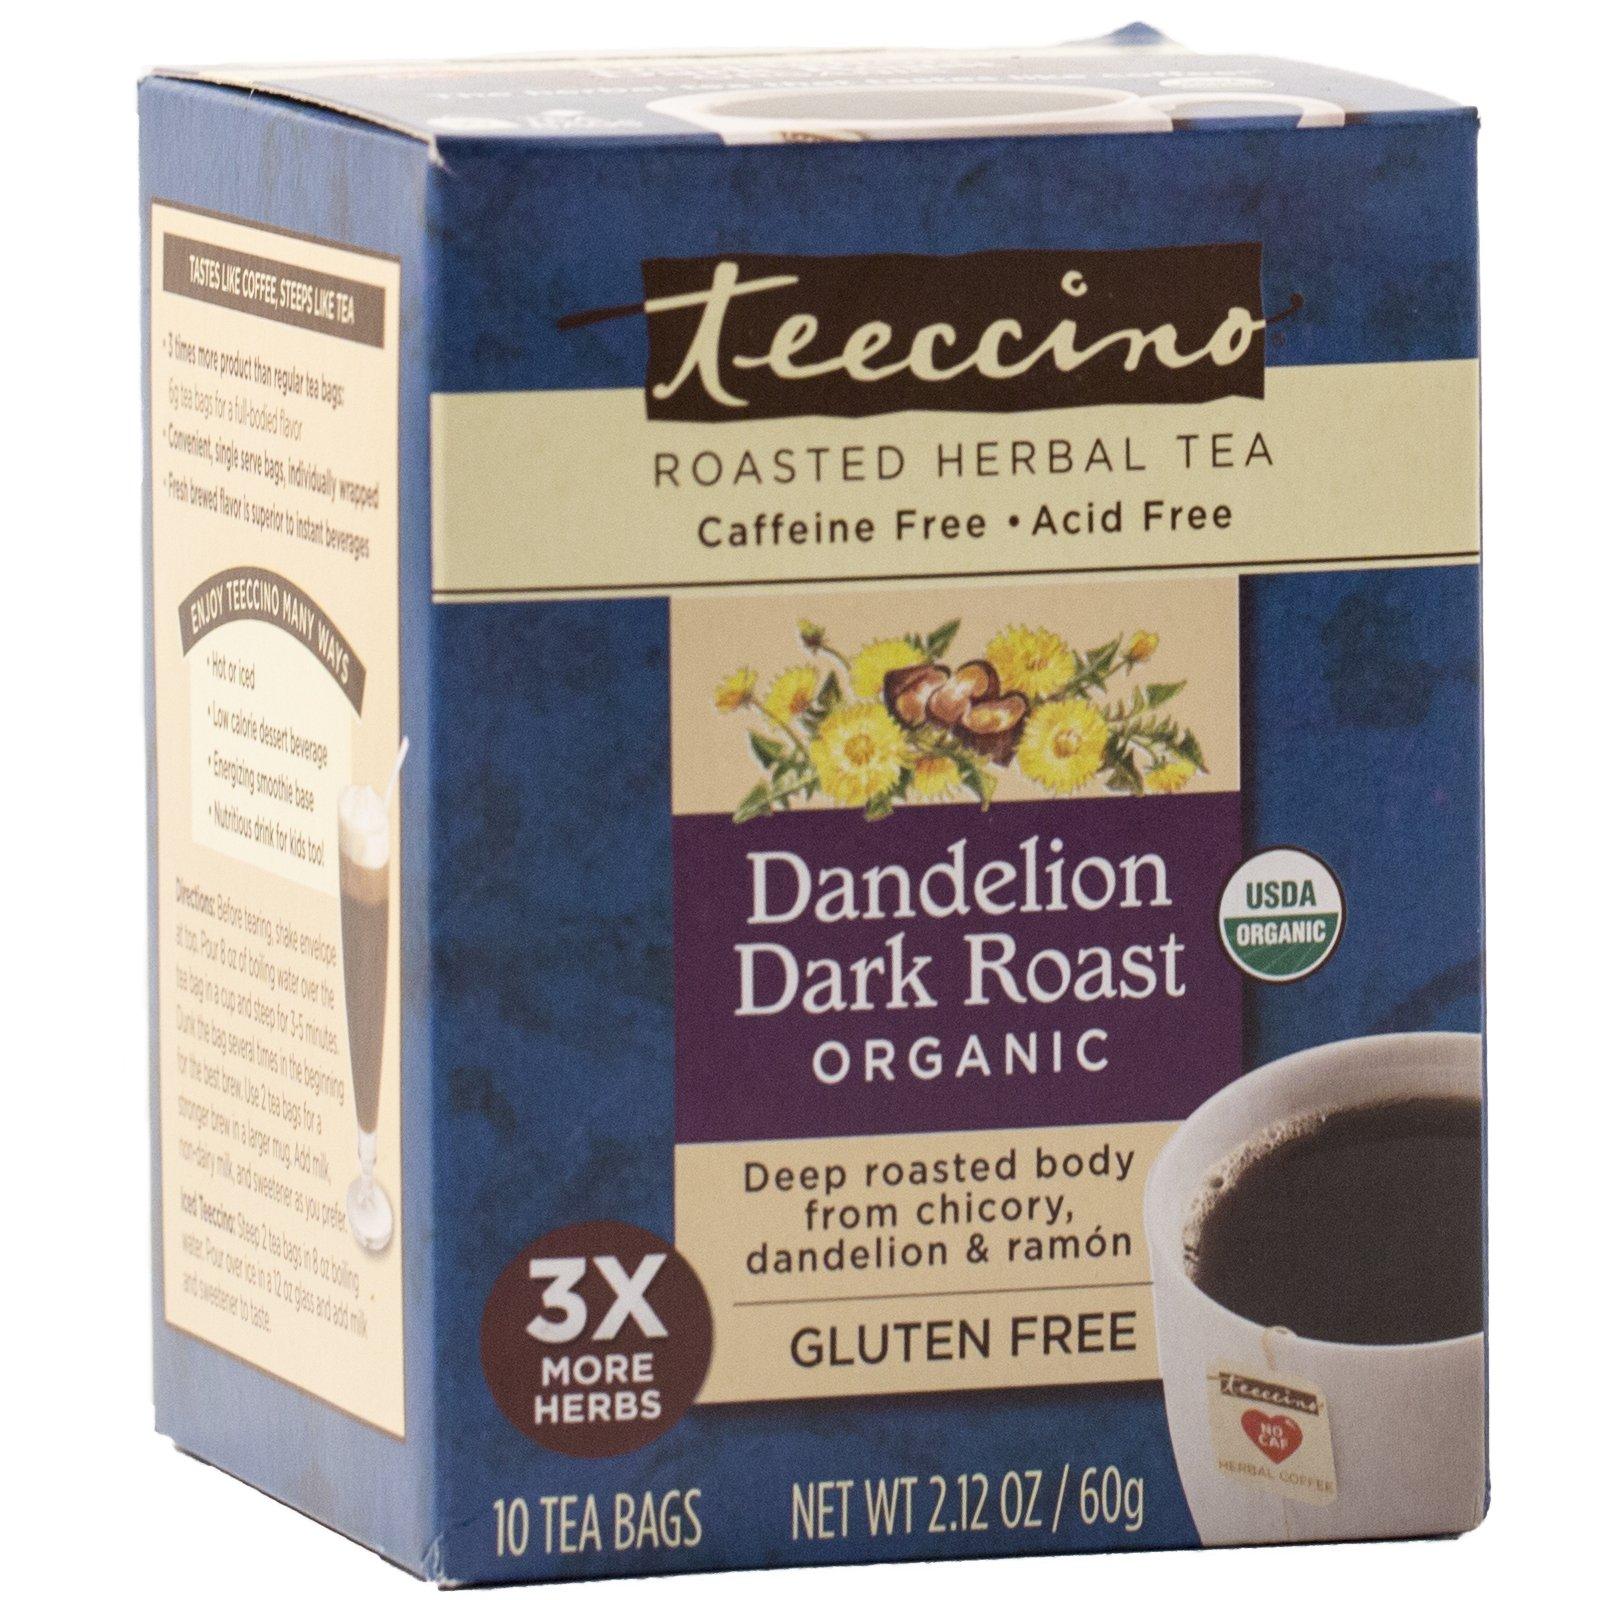 Teeccino Dandelion DETOX Tea, Organic Roasted Dandelion Root, No Gluten, No Caffeine, No Acid, 10 Tea Bags